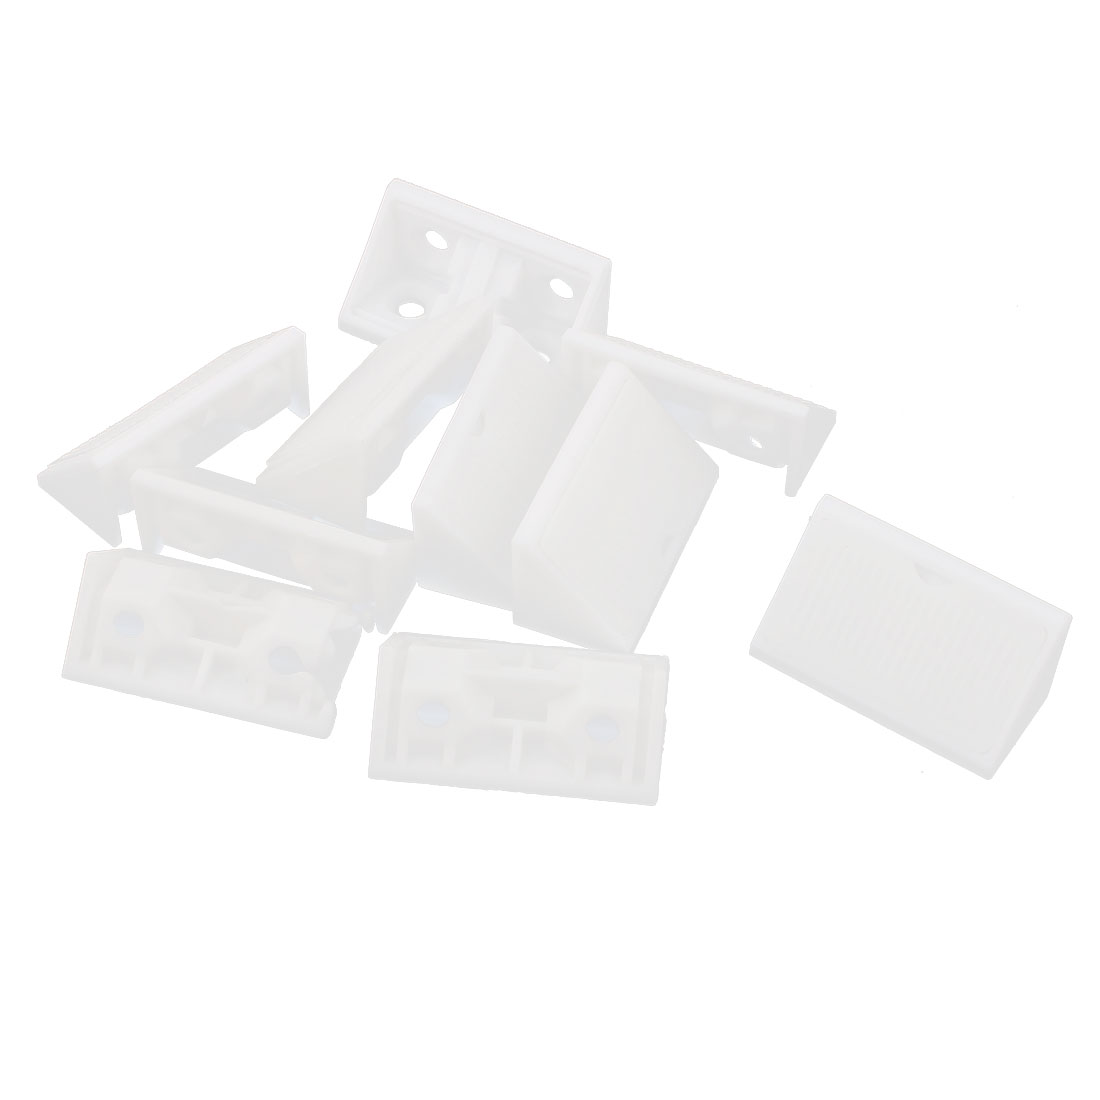 Furniture Cabinet Assembly 4mm Mounting Hole White Plastic Cranked Gusset Corner Shelf Brace Angle Brackets 10pcs